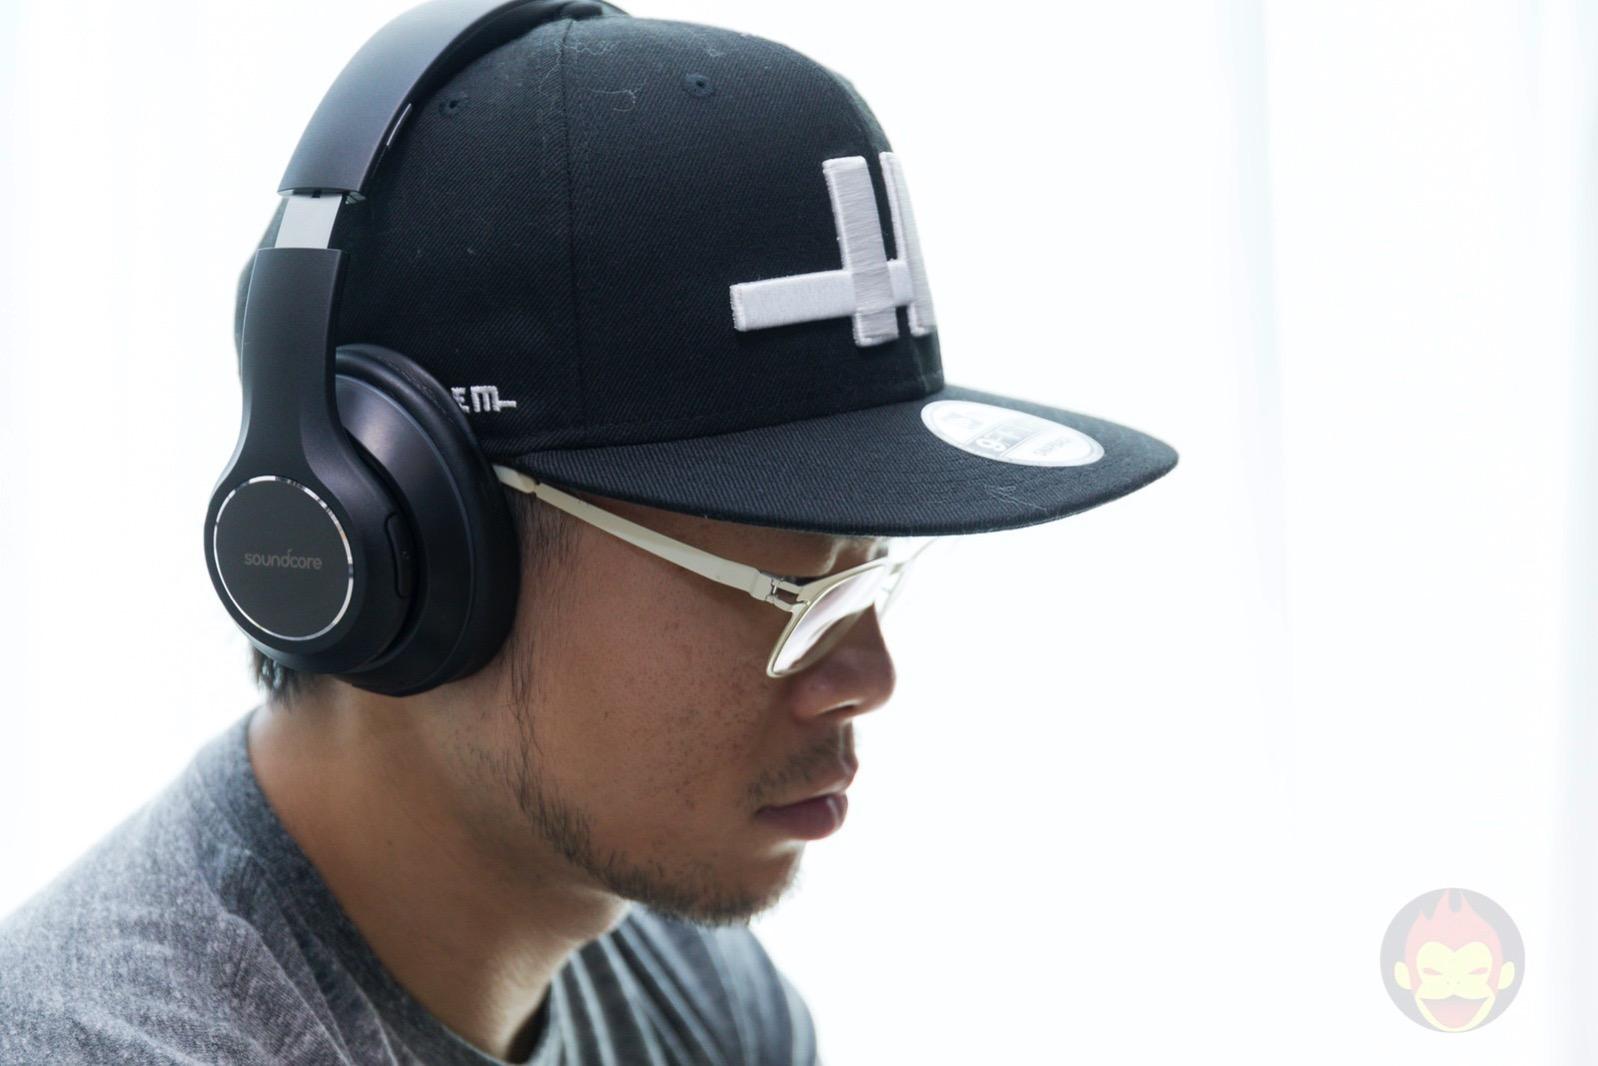 Soundcore-Vortex-Wireless-Headphones-17.jpg